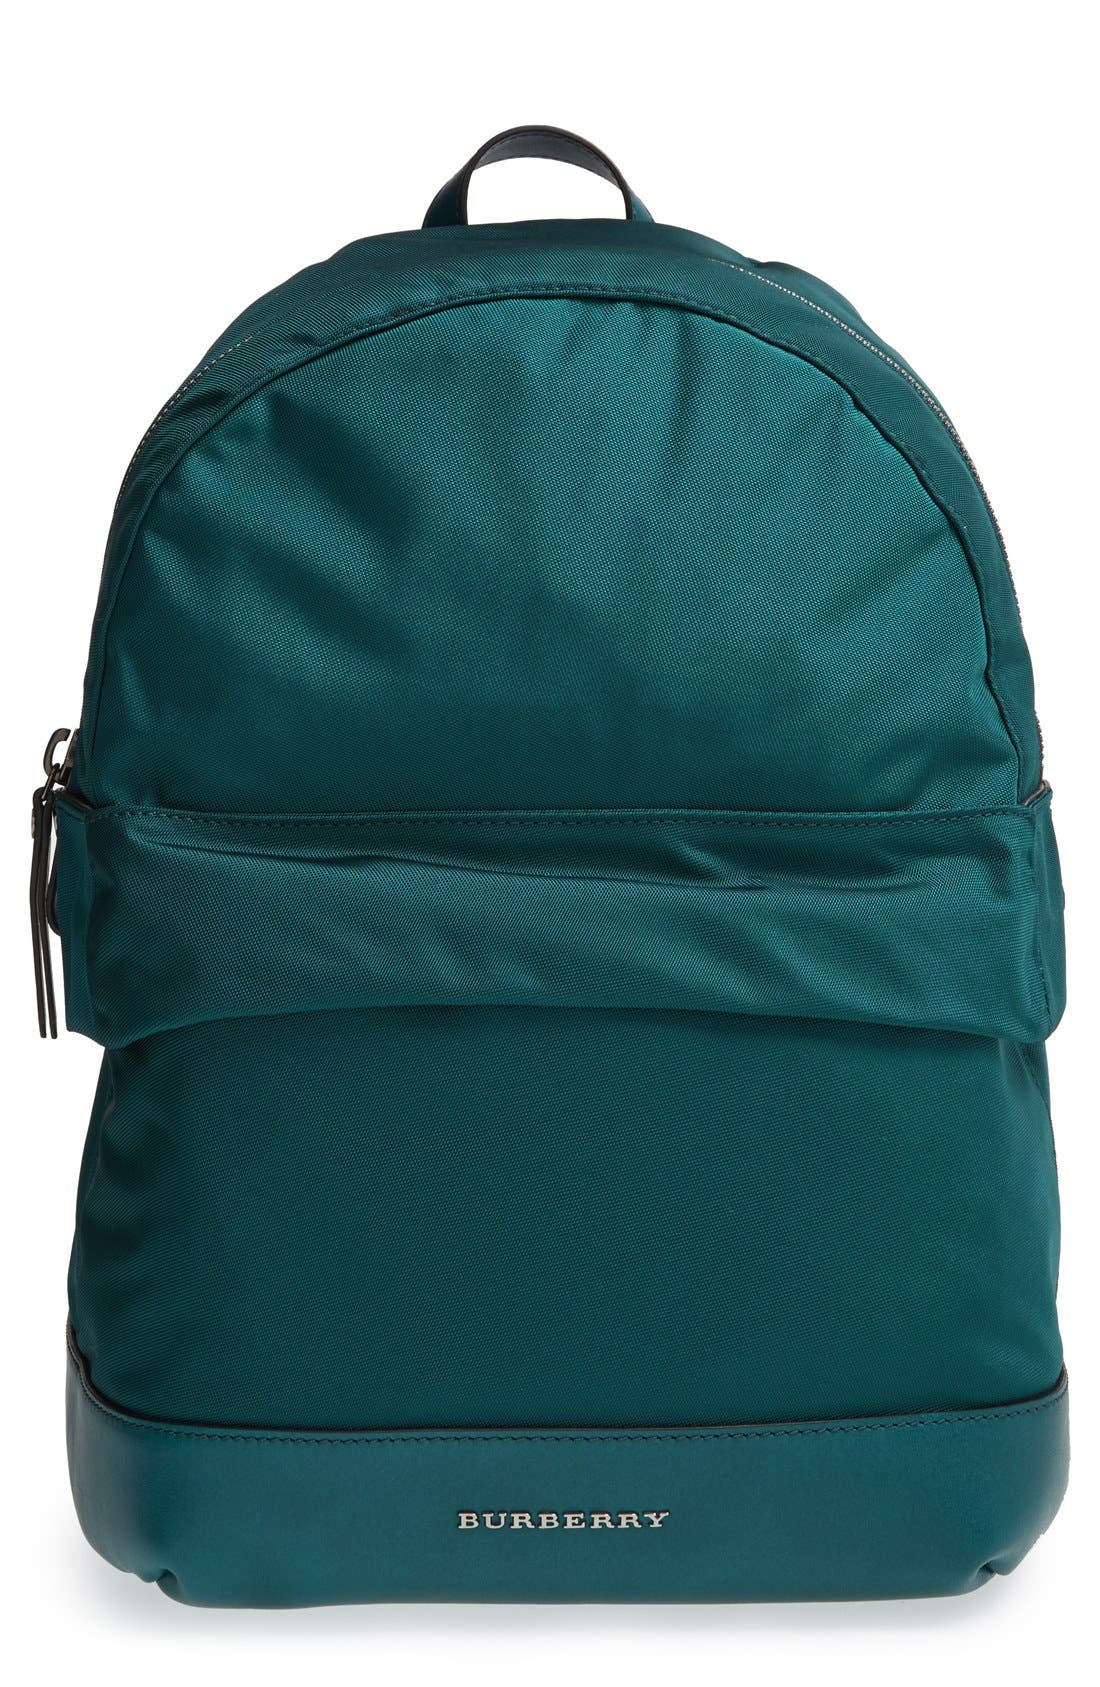 Alternate Image 1 Selected - Burberry 'Tiller' Nylon & Leather Backpack (Kids)